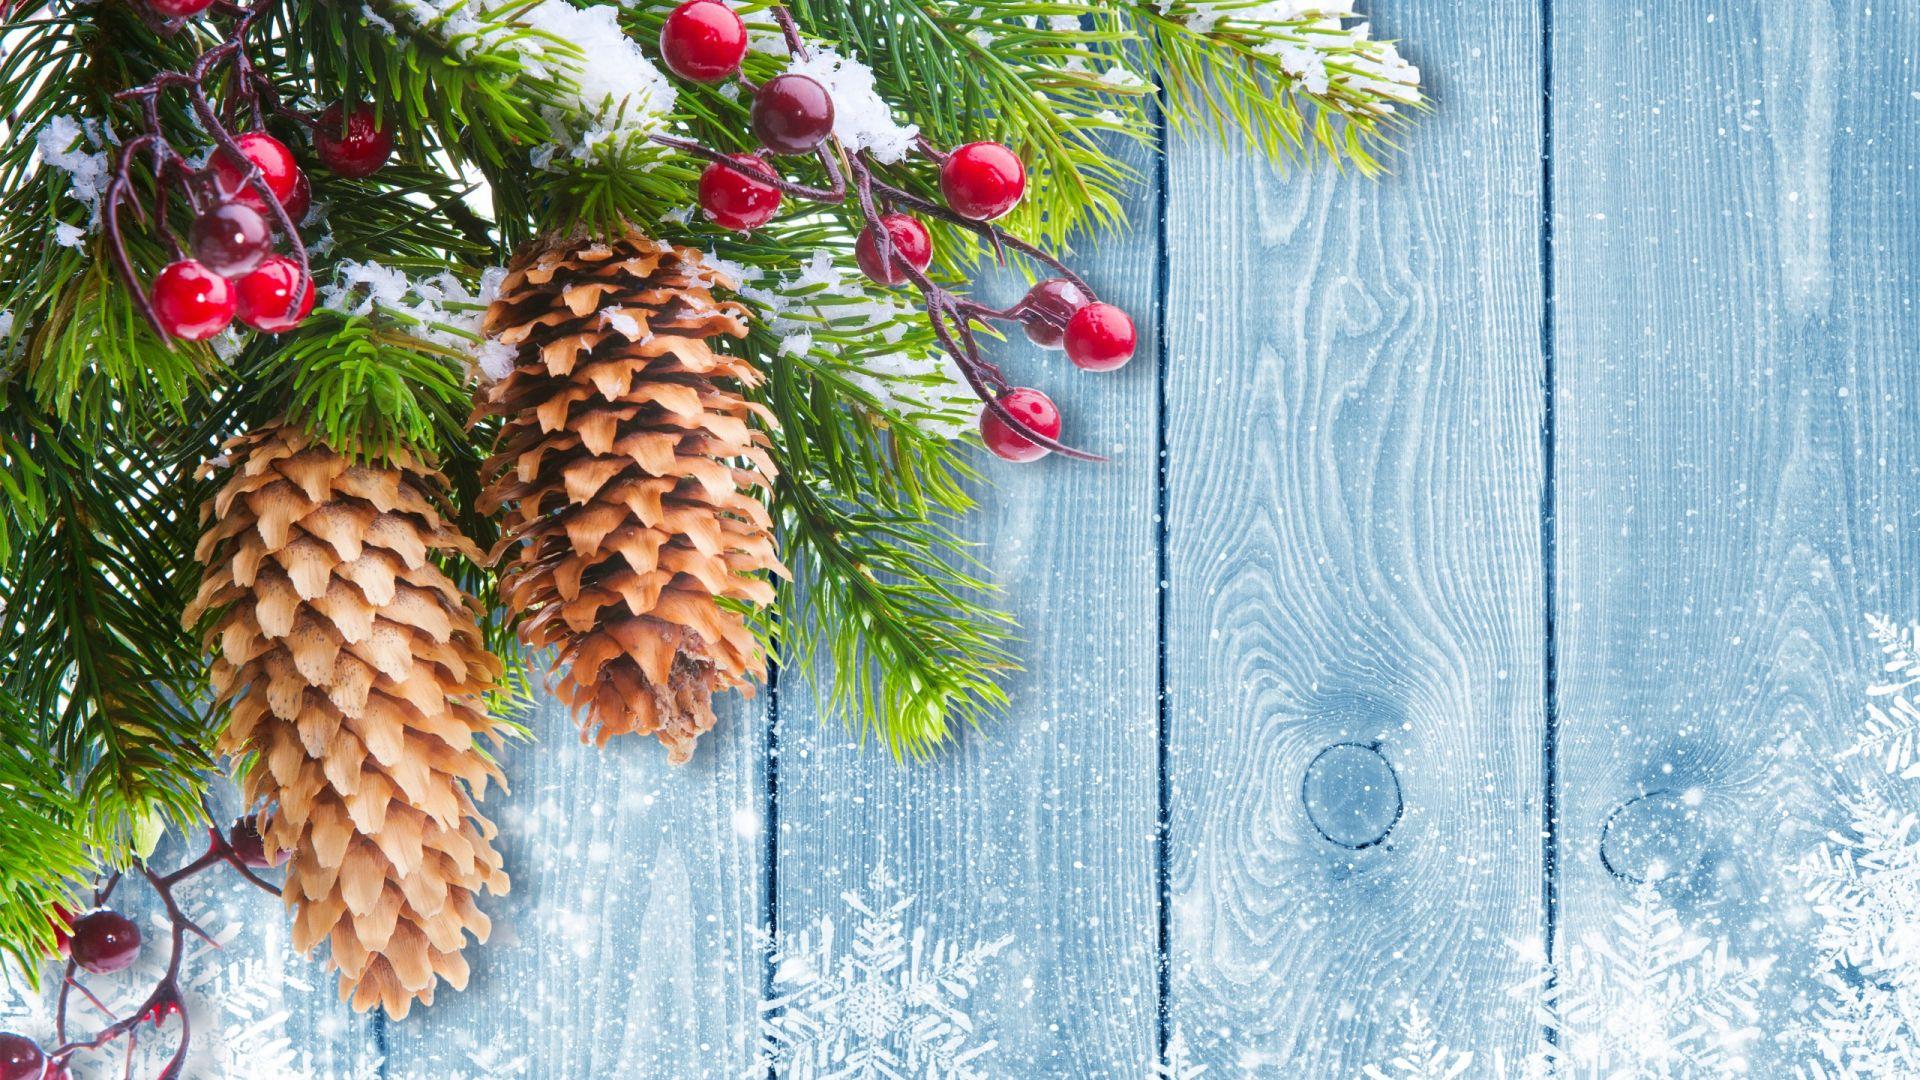 Wallpaper Christmas decorations, xmas tree, holiday